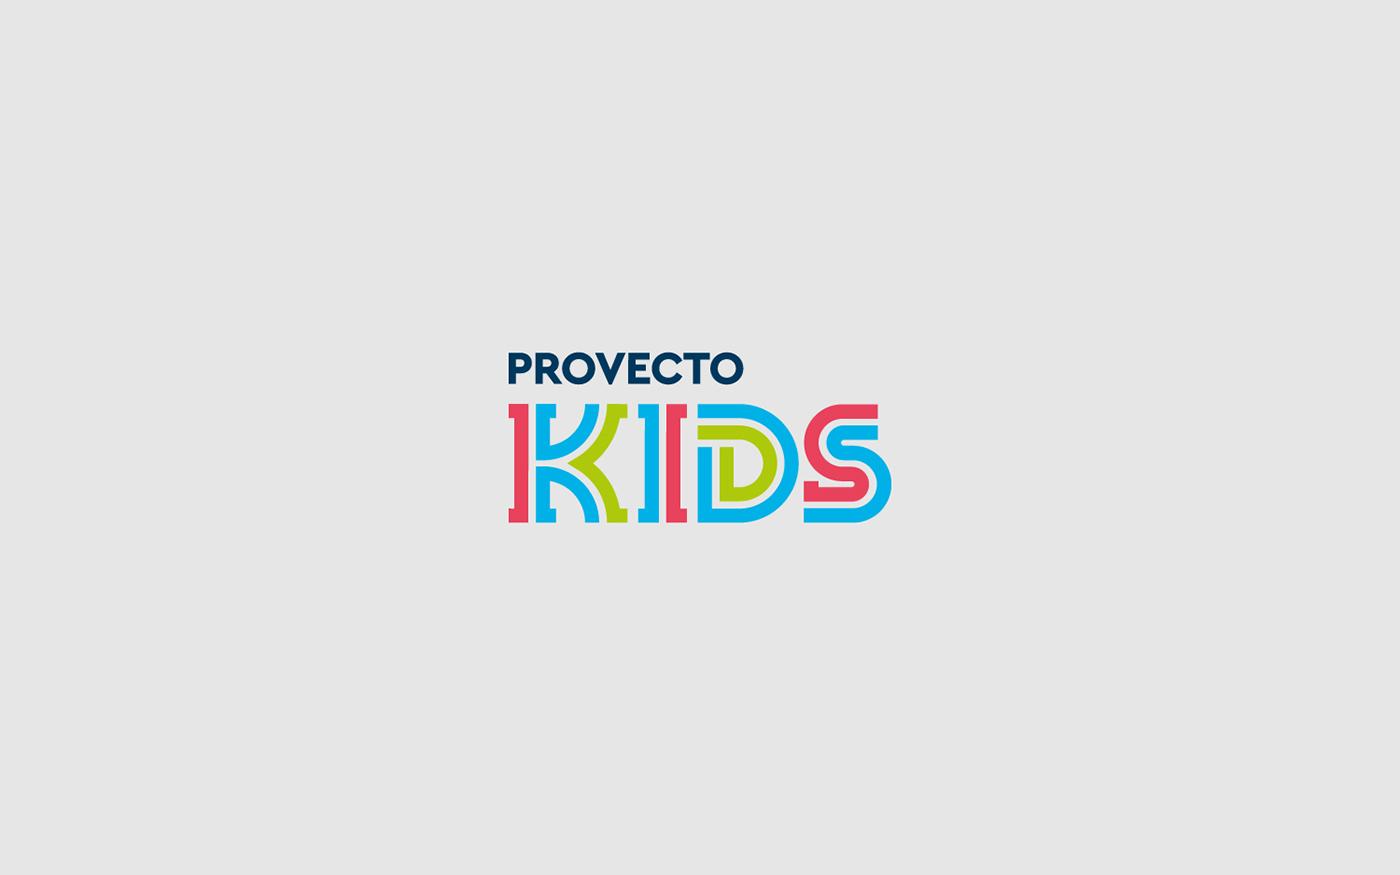 Provecto学校品牌形象及环境导视设计 © Vibri Design & Branding